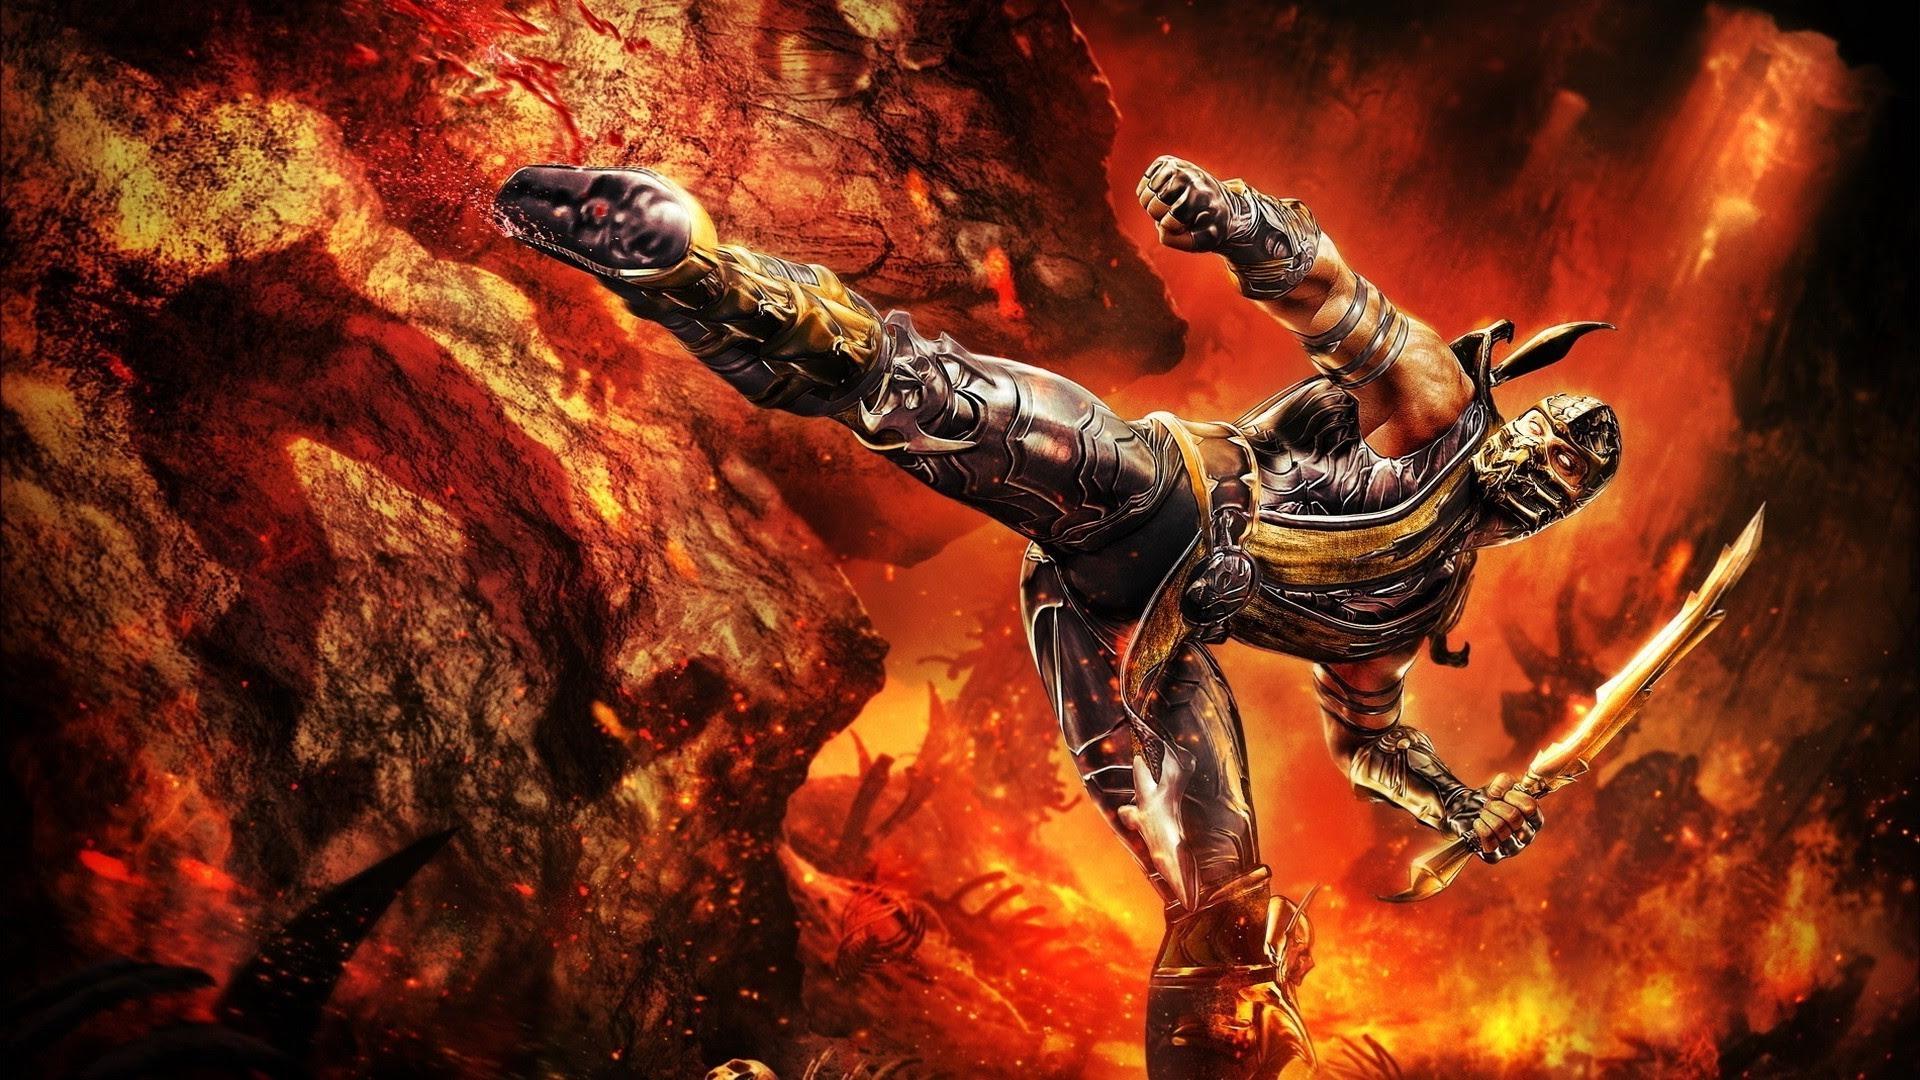 Warrior Mortal Kombat Artwork Video Games Fantasy Art Digital Art Chains Scorpion Wallpaper And